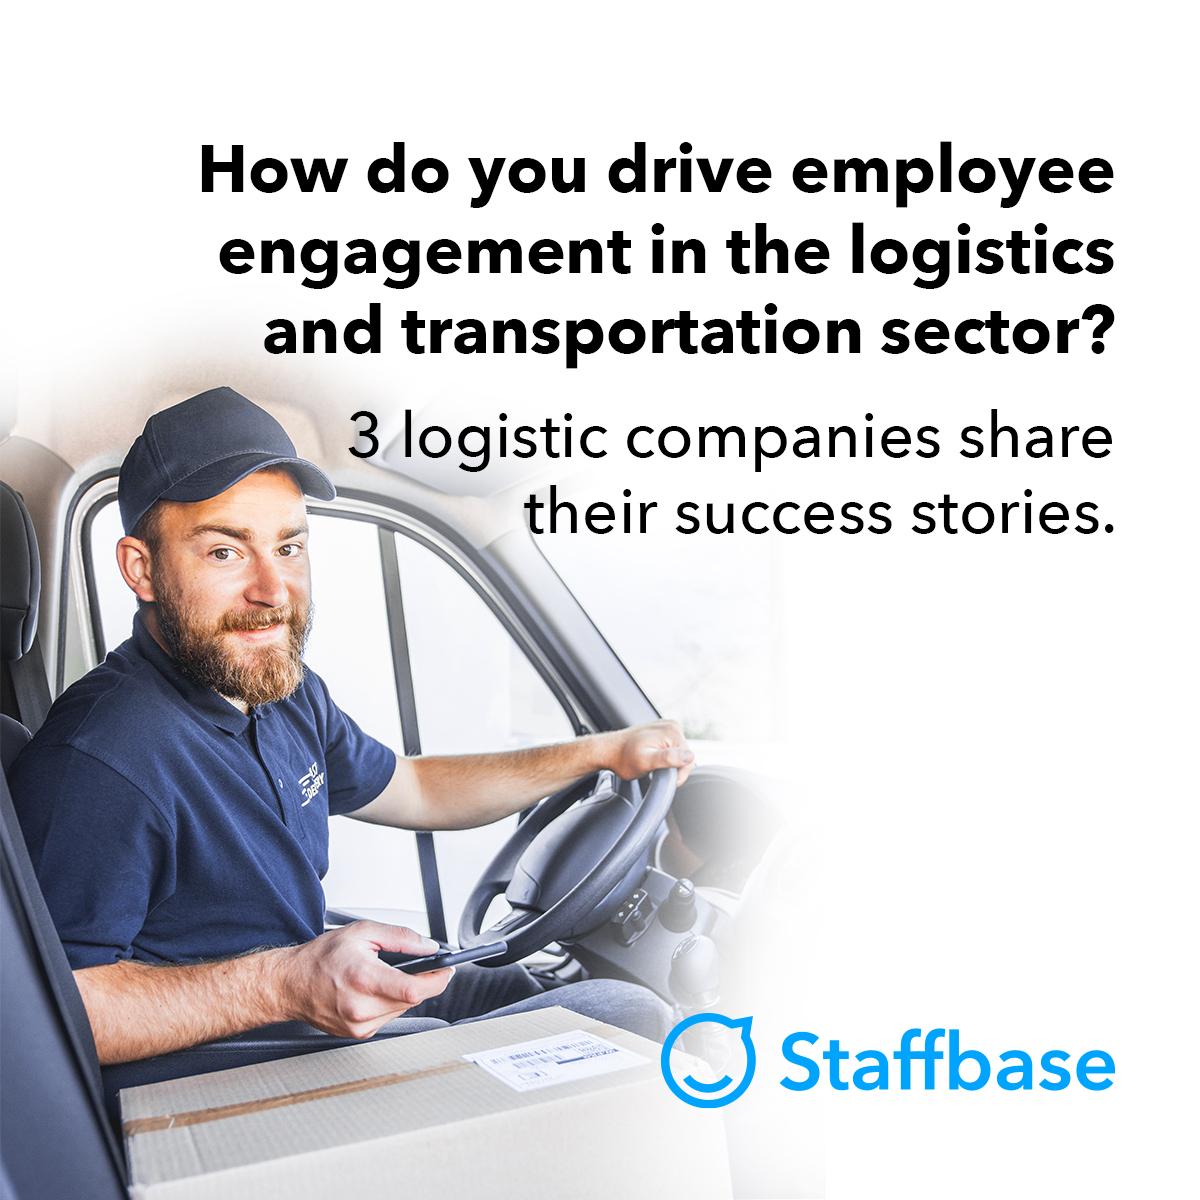 Staffbase Logistics & Transportation eBook